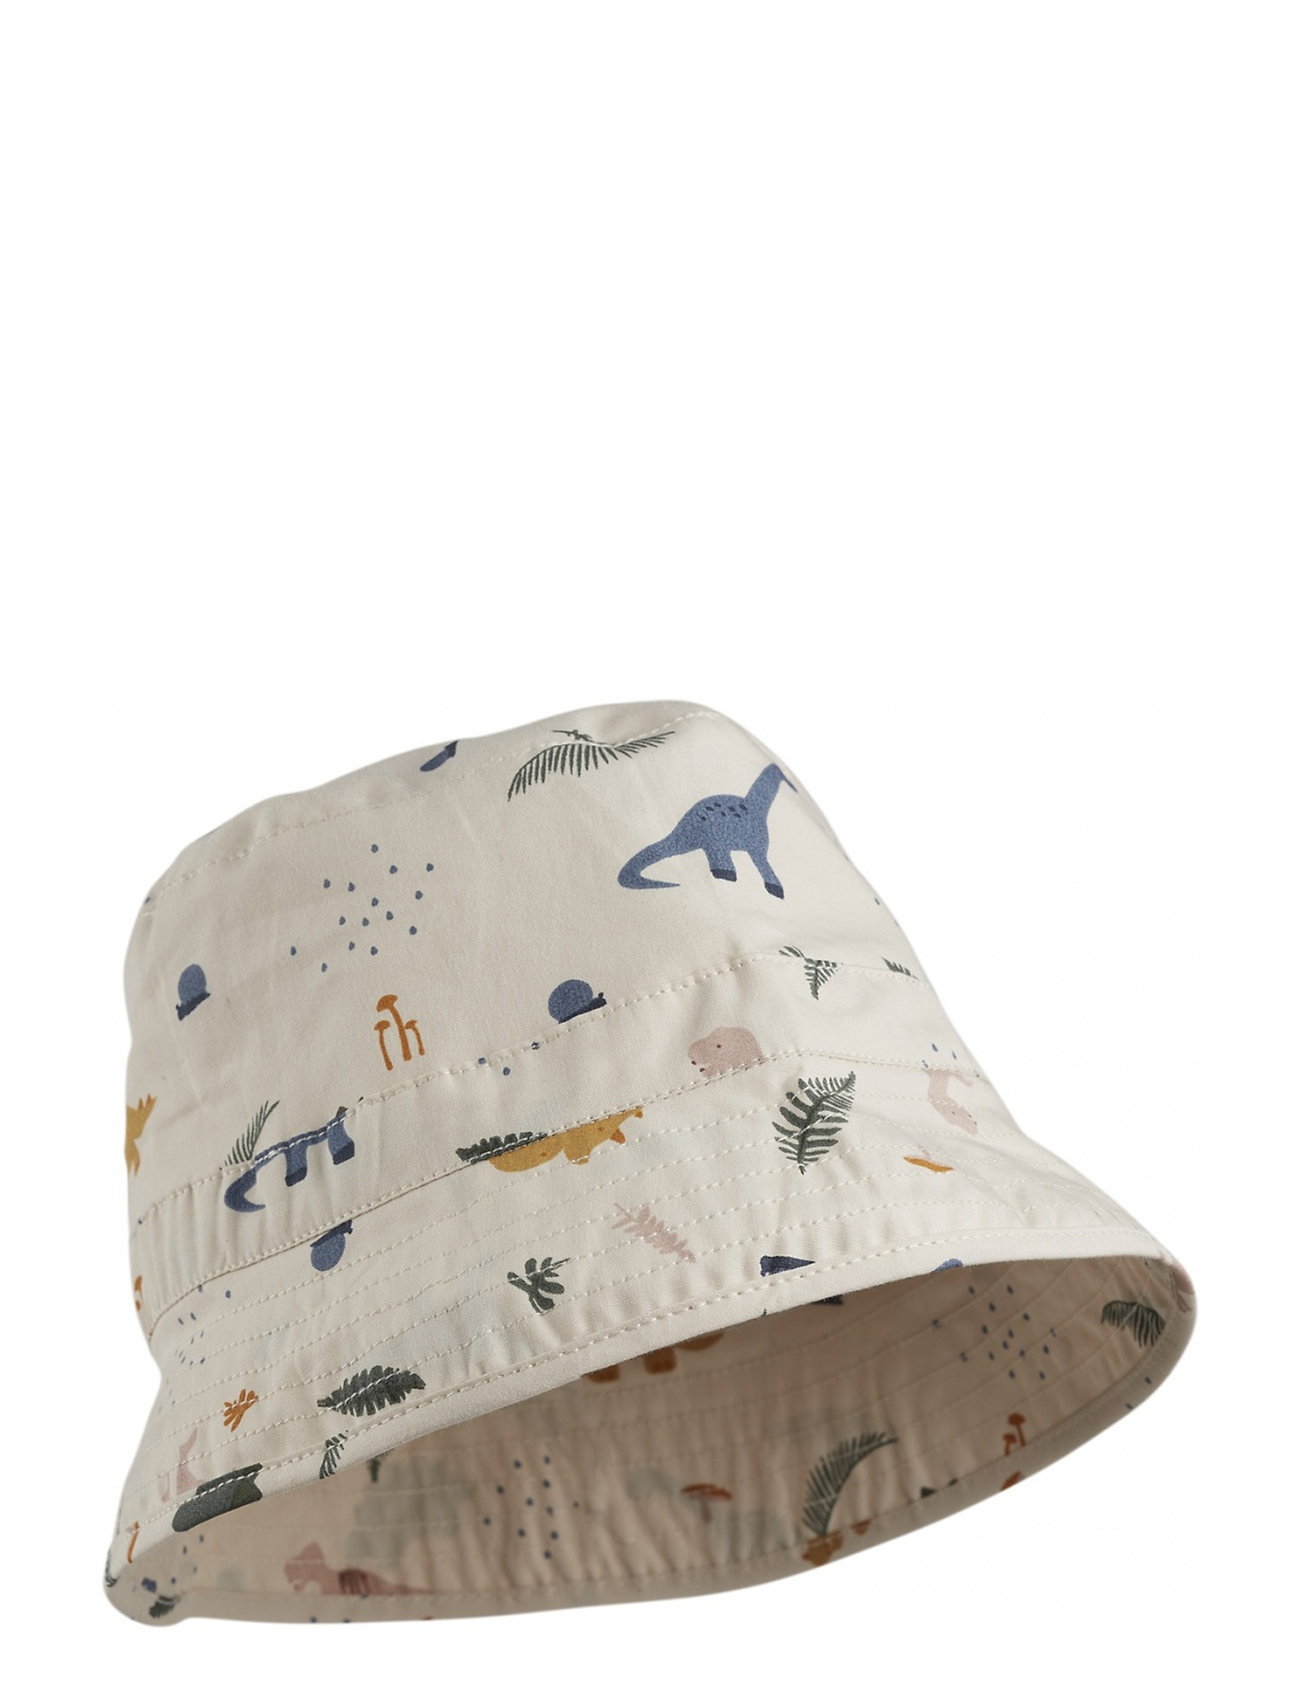 Liewood Jack bucket hat - DINO MIX